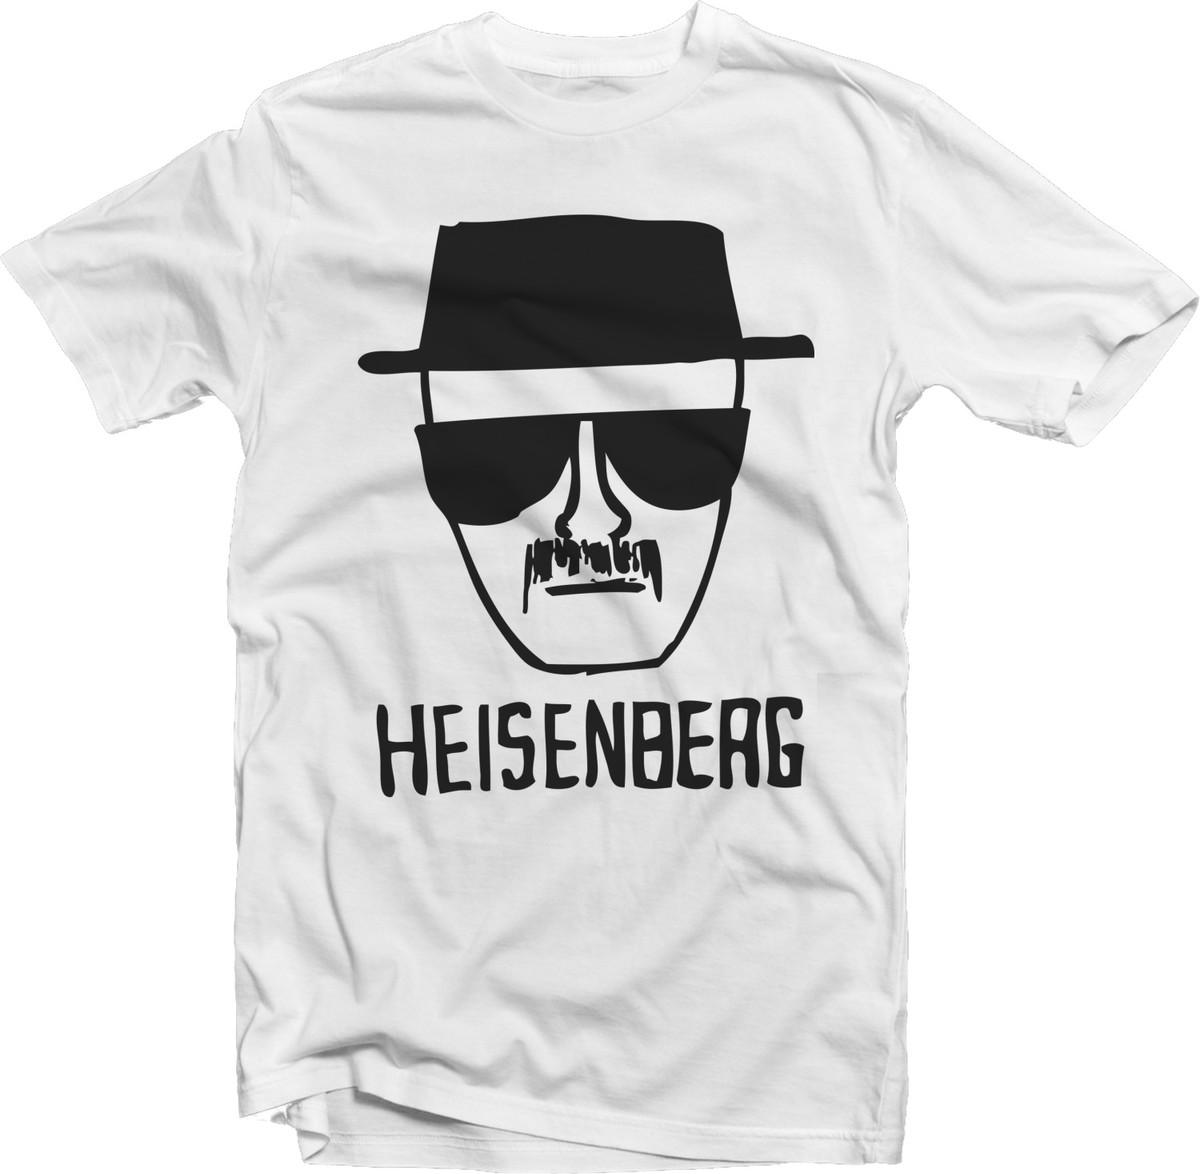 63382e5de Camiseta Série Breaking Bad Heisenberg Branca 01 no Elo7